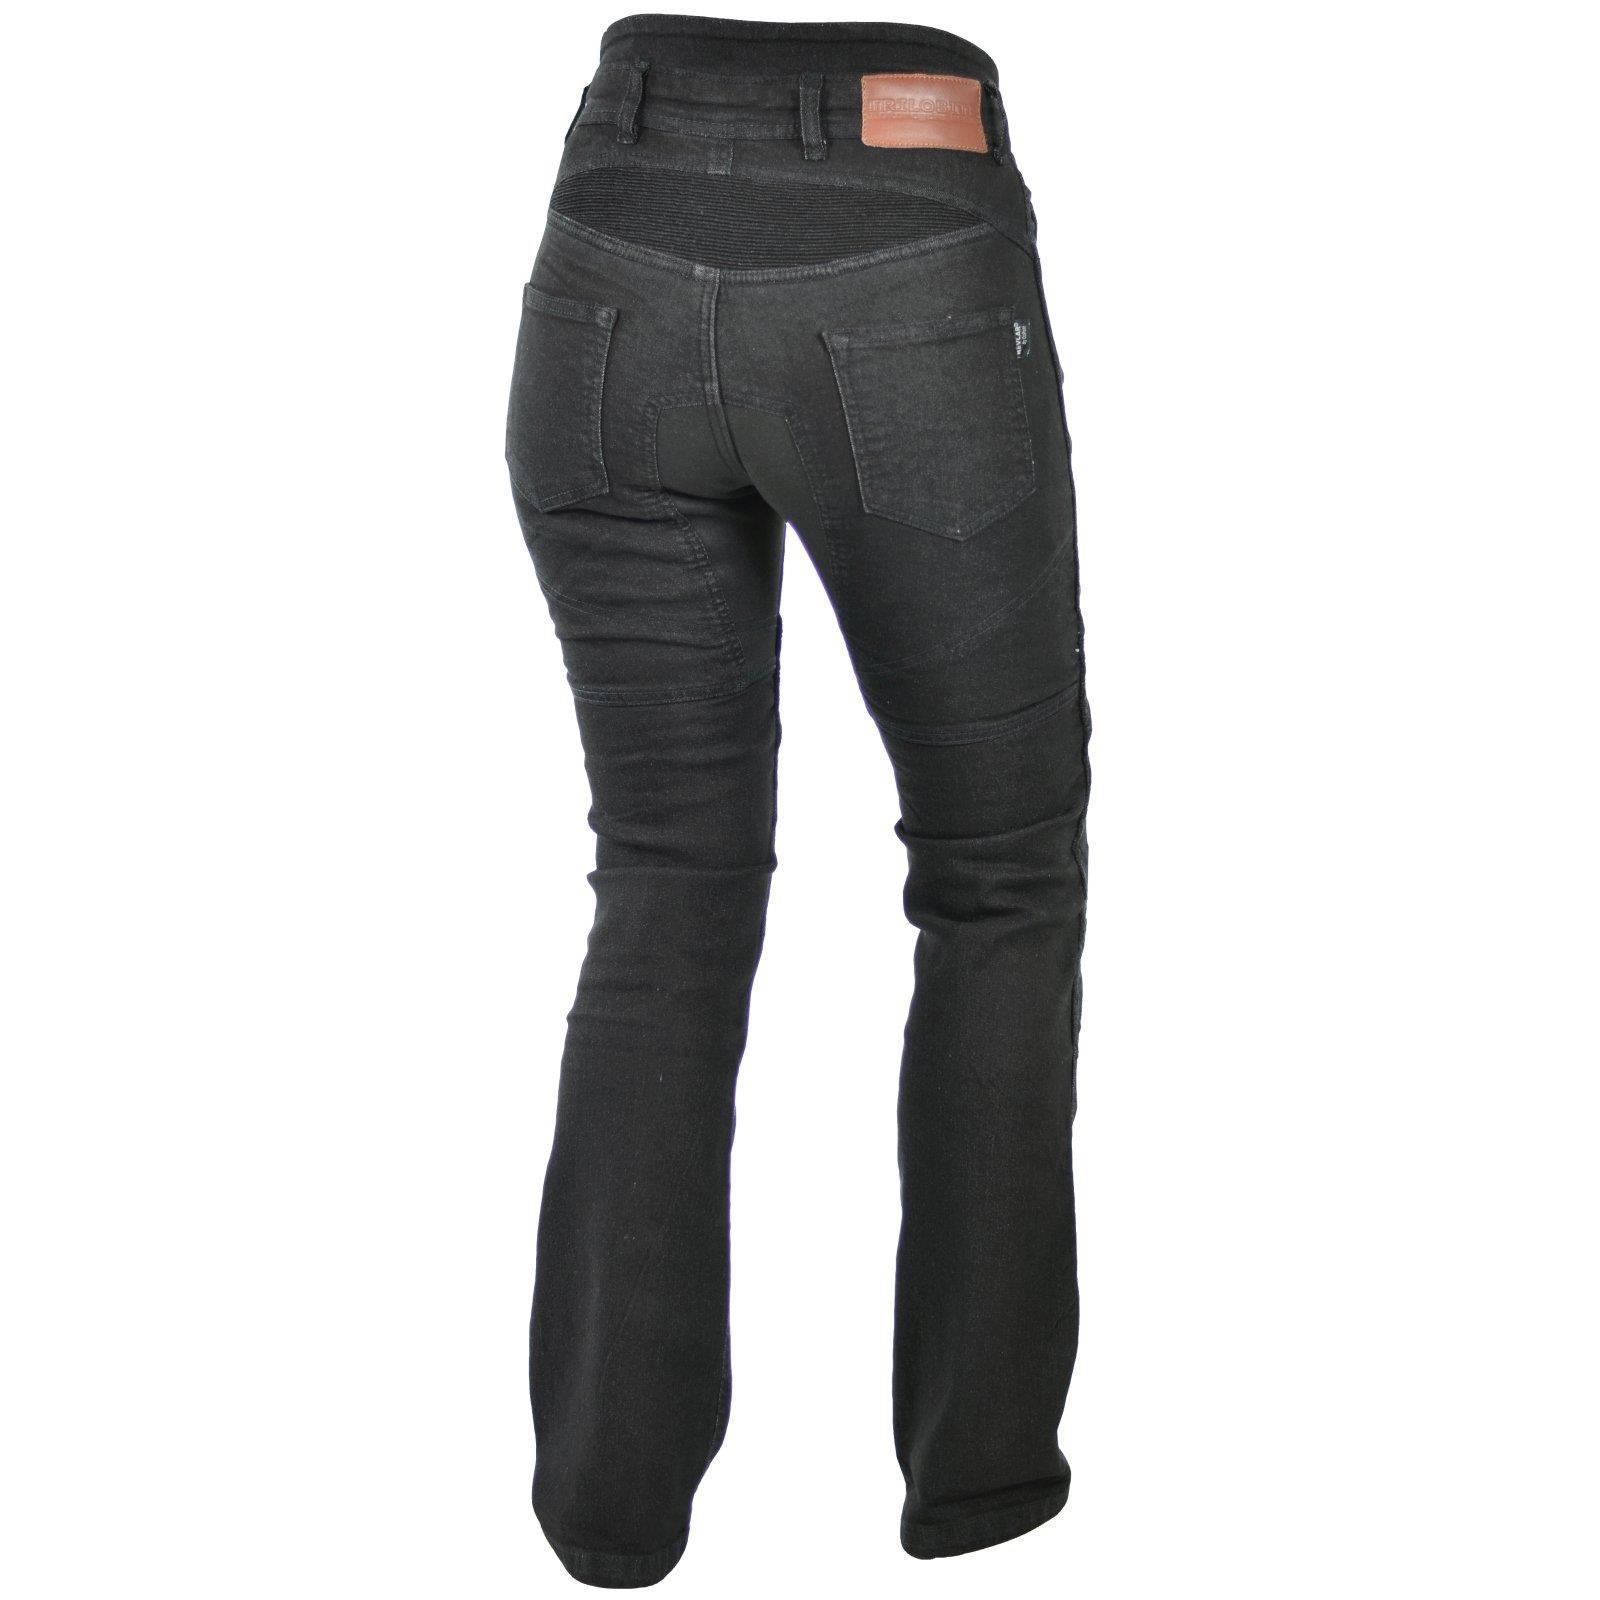 Trilobite-Pantaloni-Moto-Jeans-Abbigliamento-Parado-MICAS-URBAN-DUAL-PANTS-ACID miniatura 76